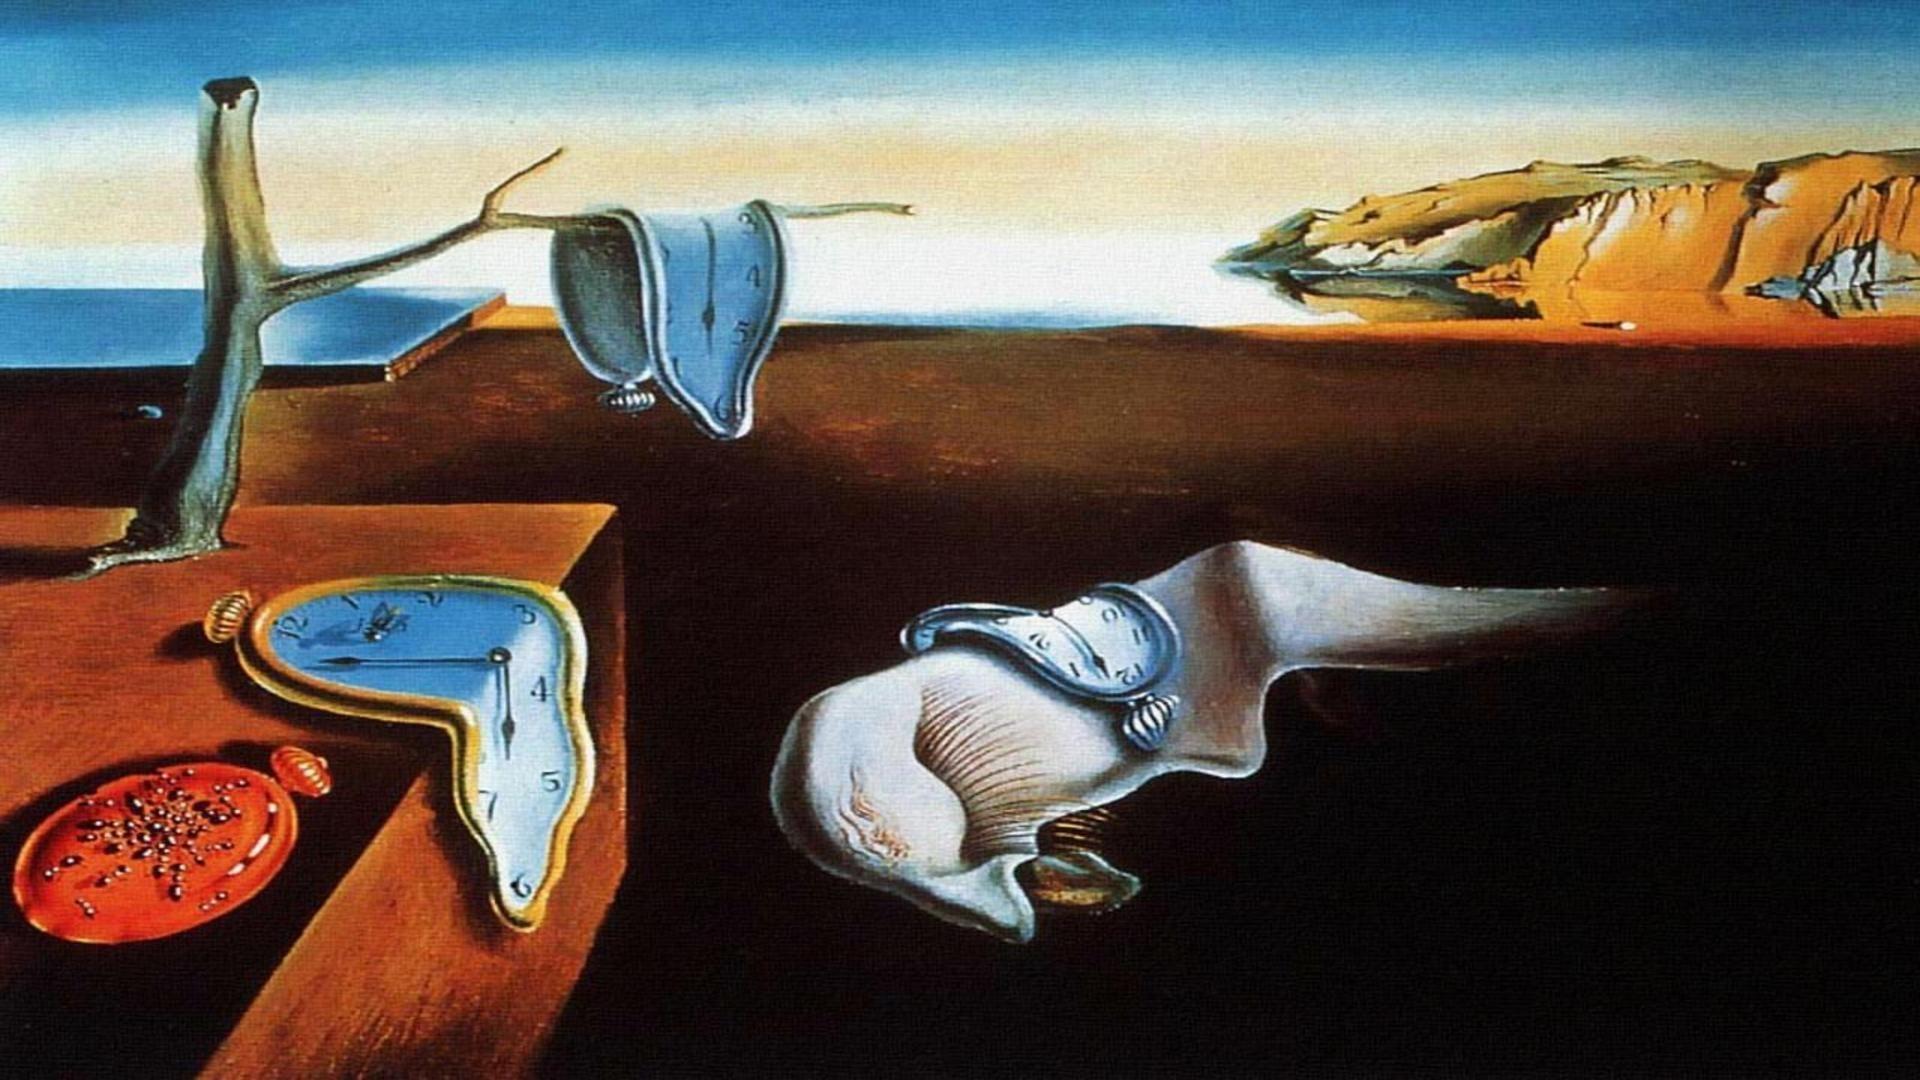 https://magnifisonz.com/wp-content/uploads/2017/05/the-persistence-of-memory-salvador-dali_121638270.jpg